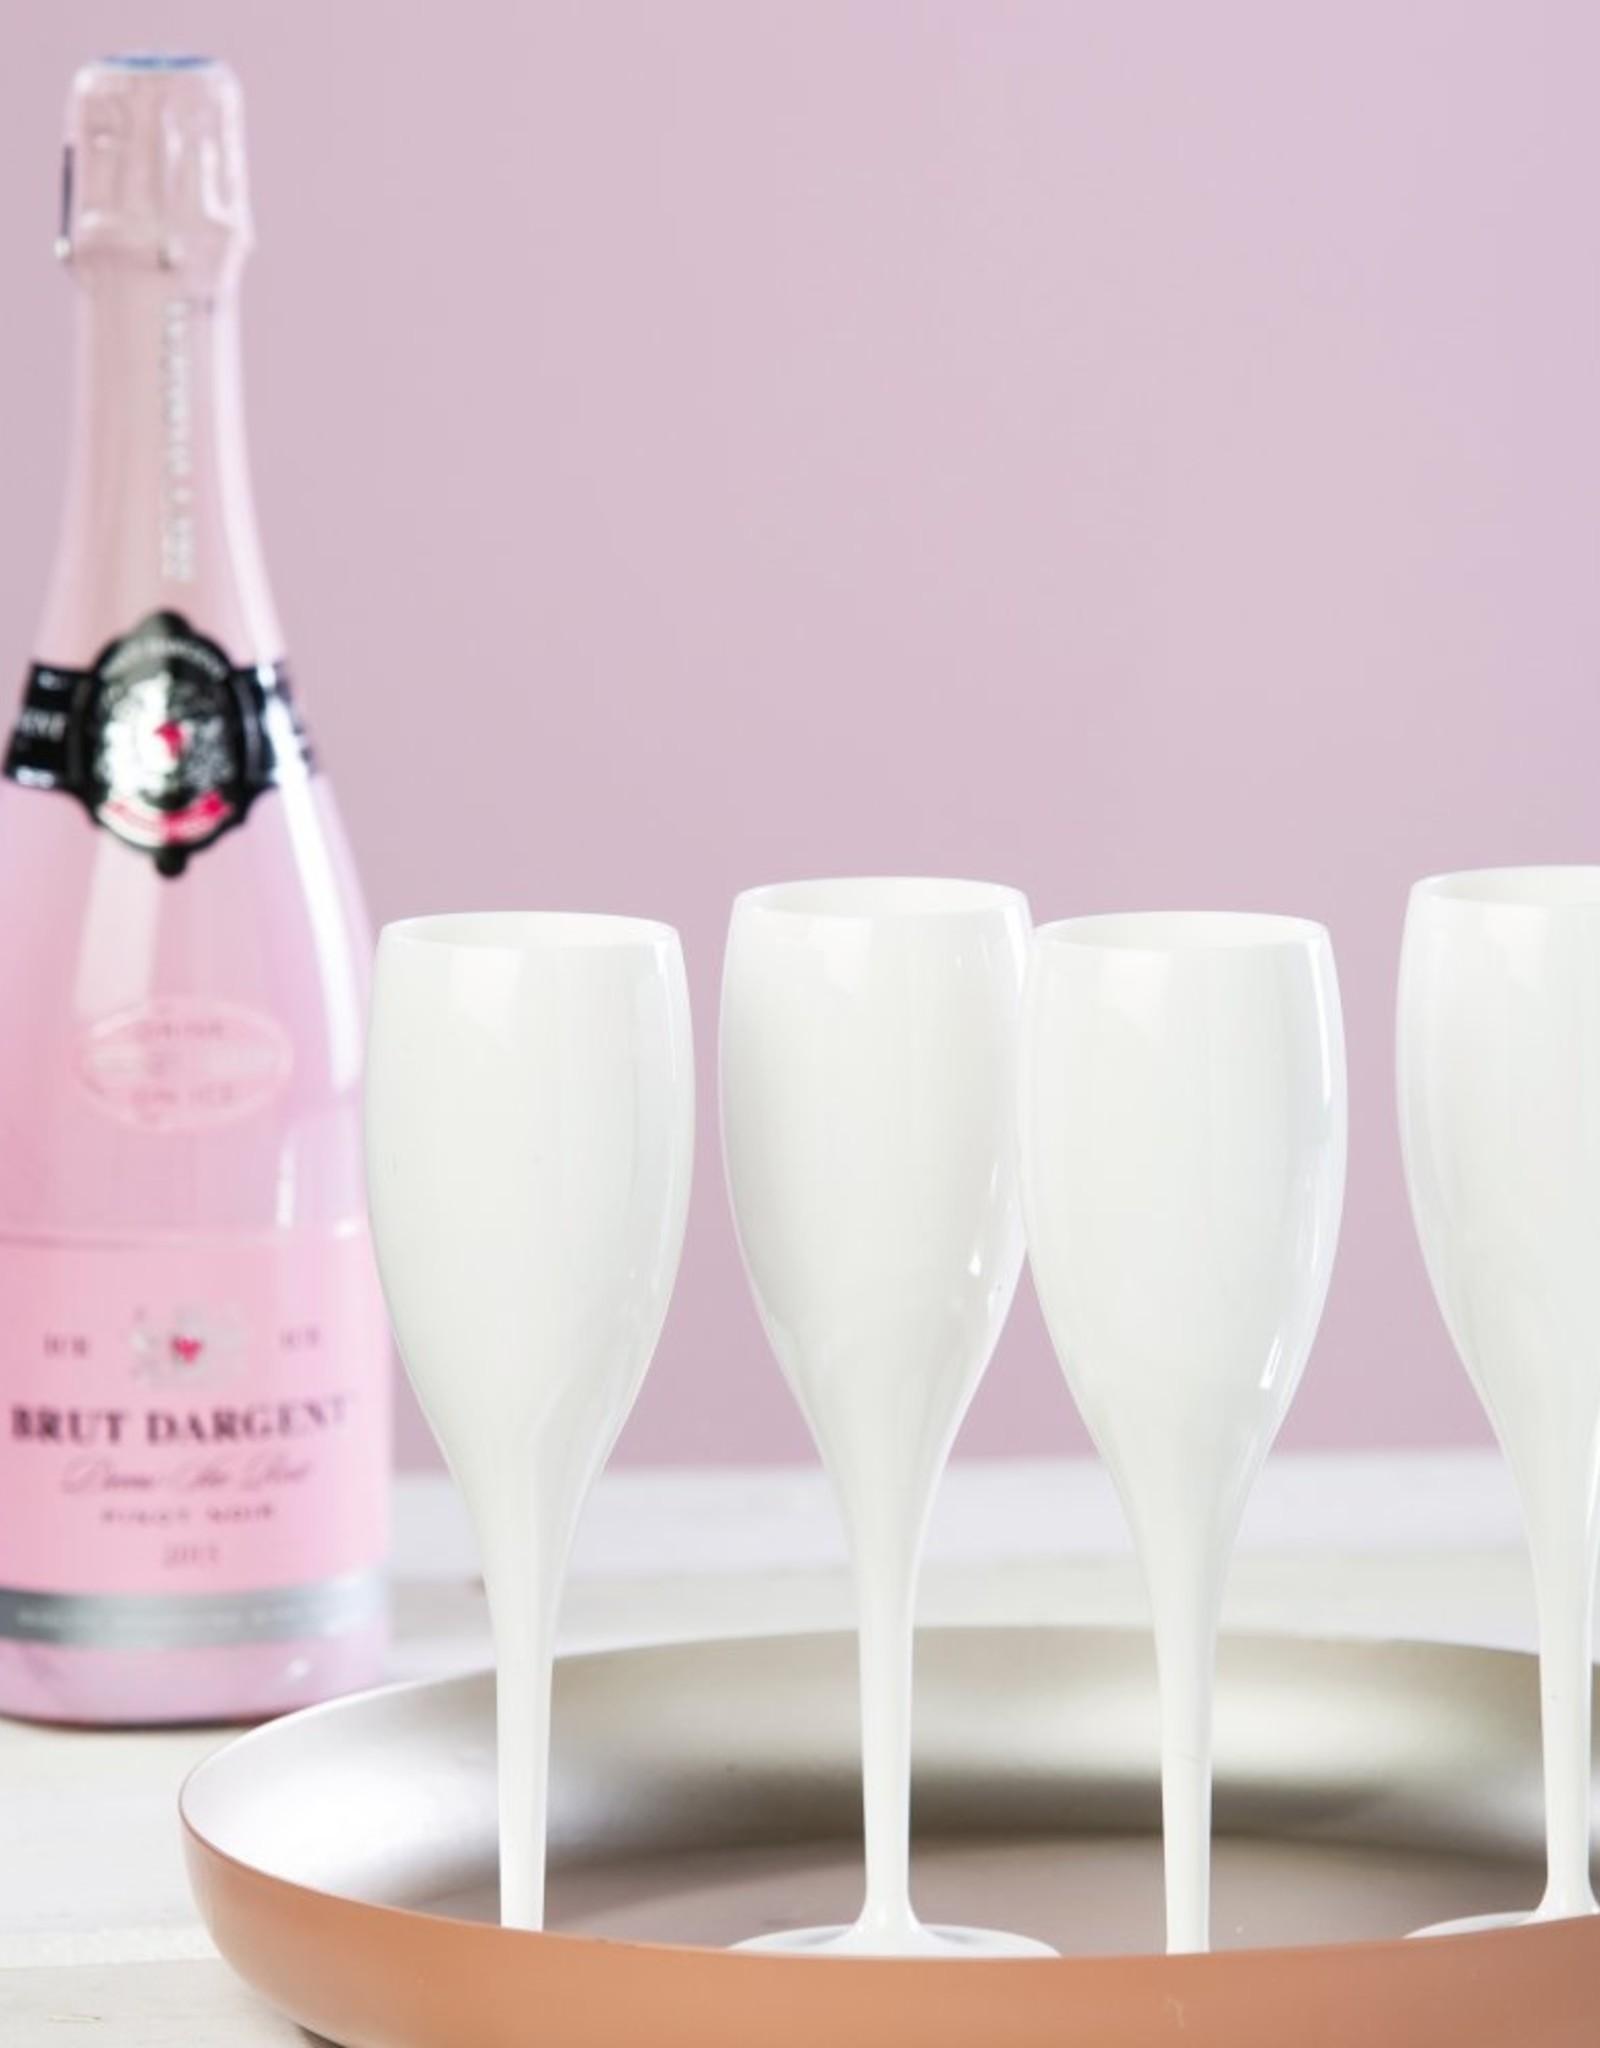 Koziol Koziol Champagneglas - Cheers No. 1 Superglas - 100 ml - Wit Cotton